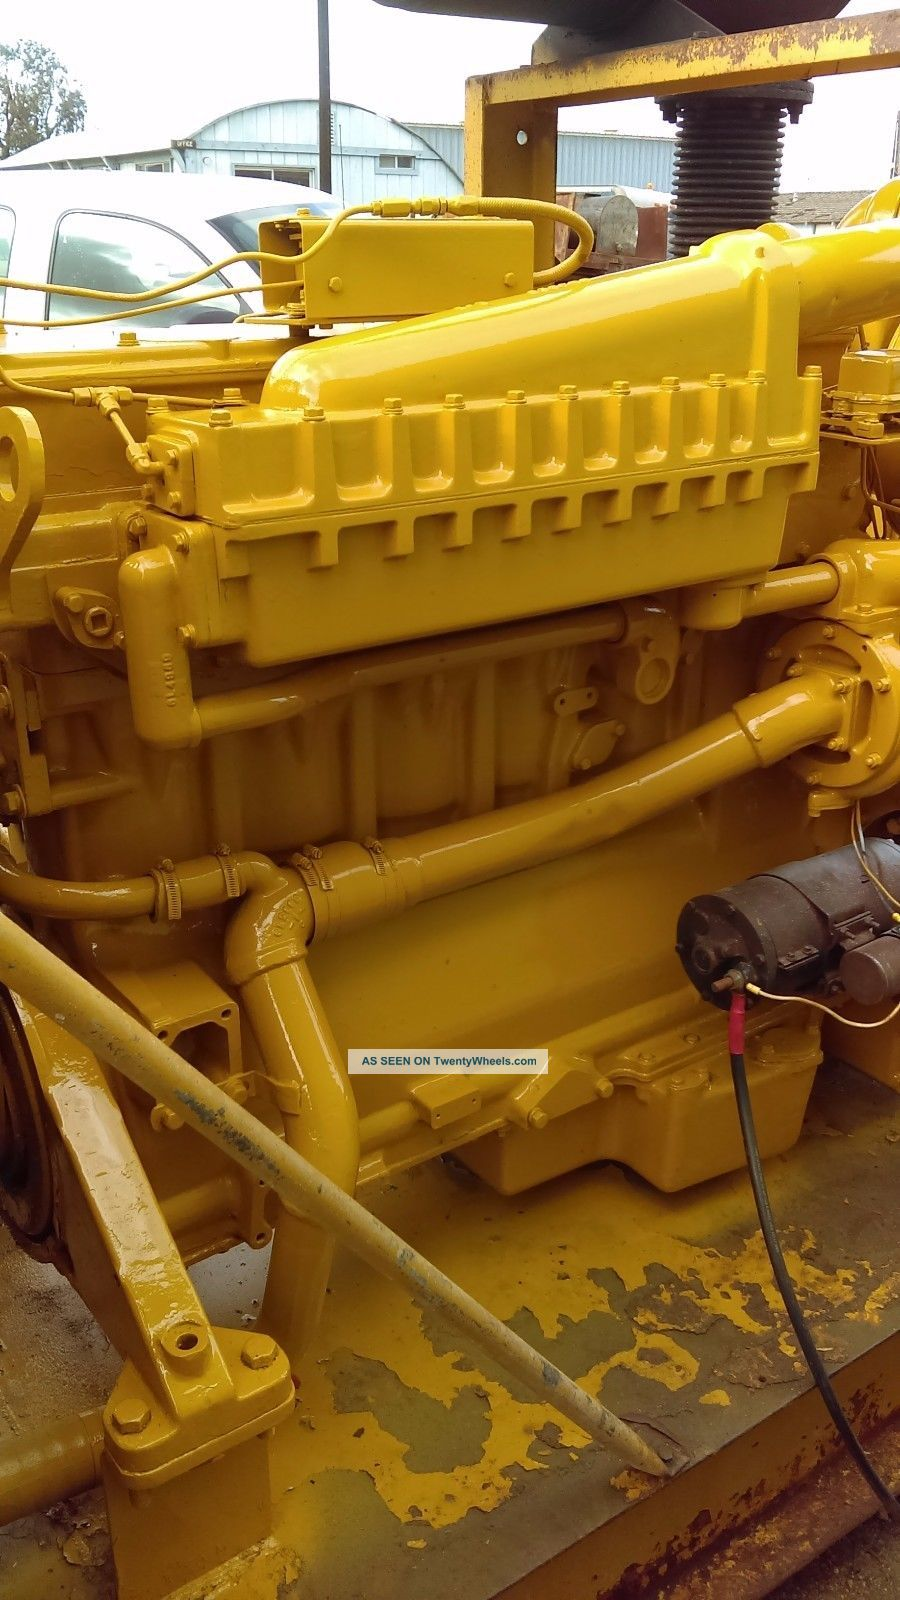 d343 cat engine specs  d343  free engine image for user manual download Cat D343 Engine Cat D343 Engine